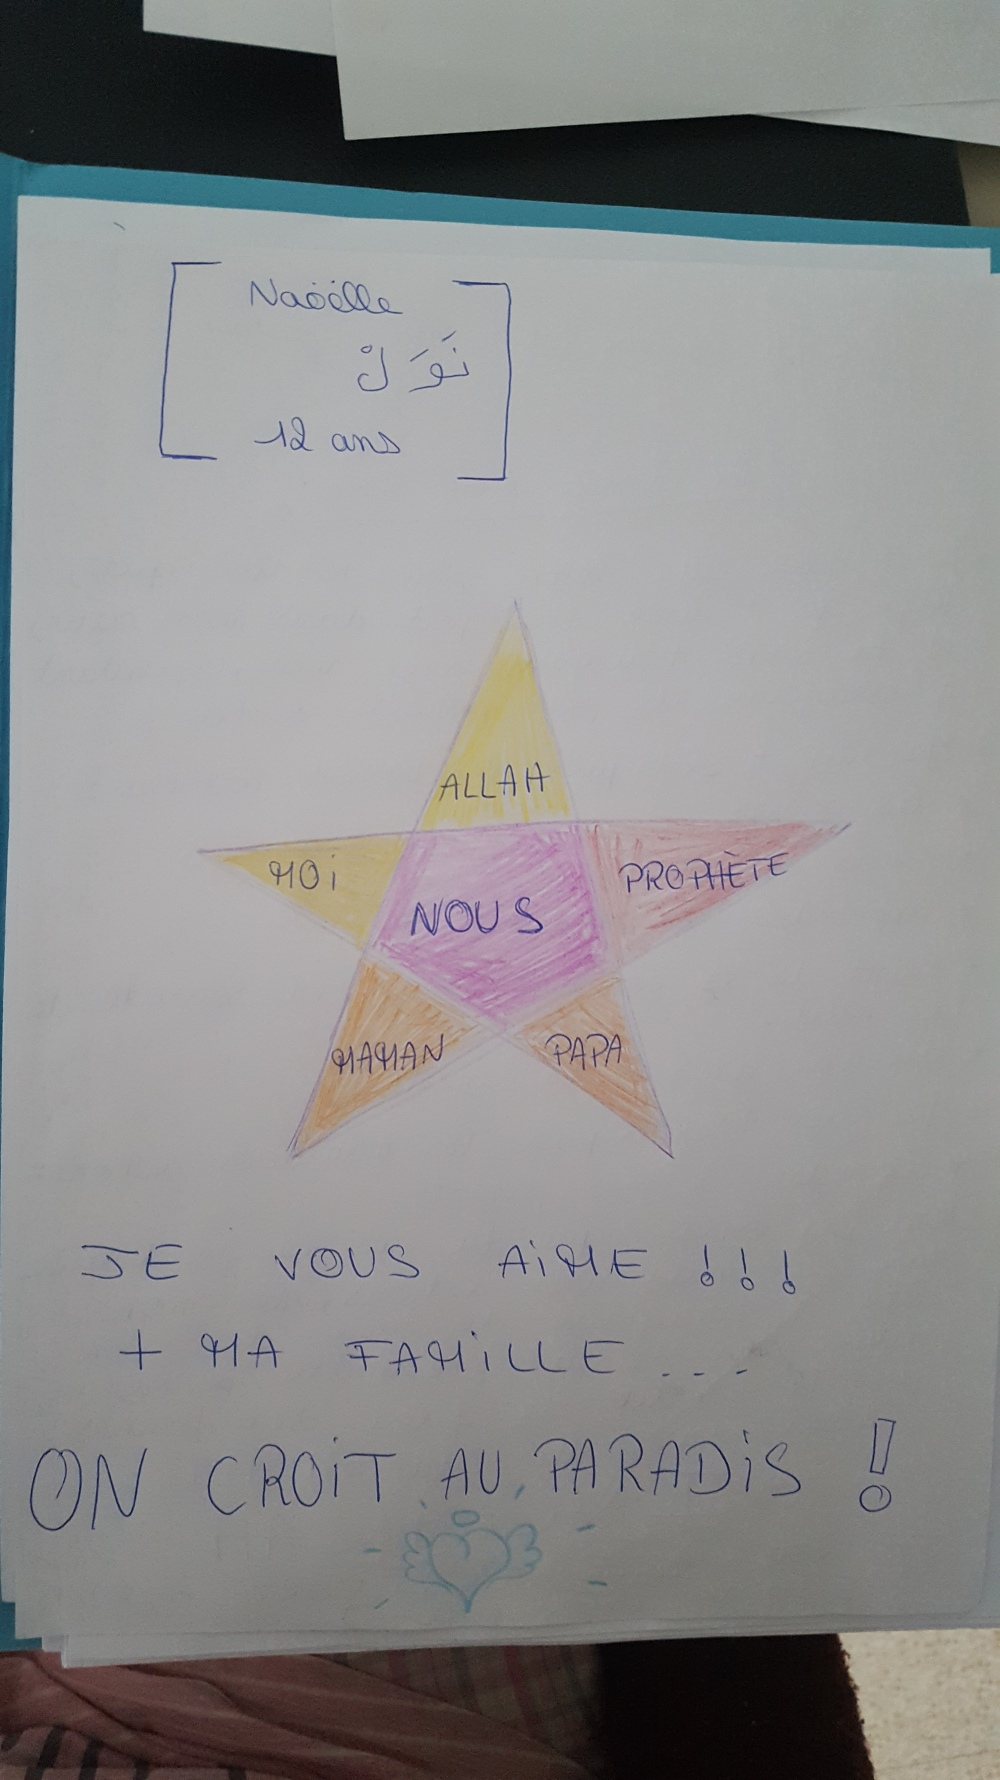 Naoelle 2_2 (12ans) (1) - Assma Basalamah